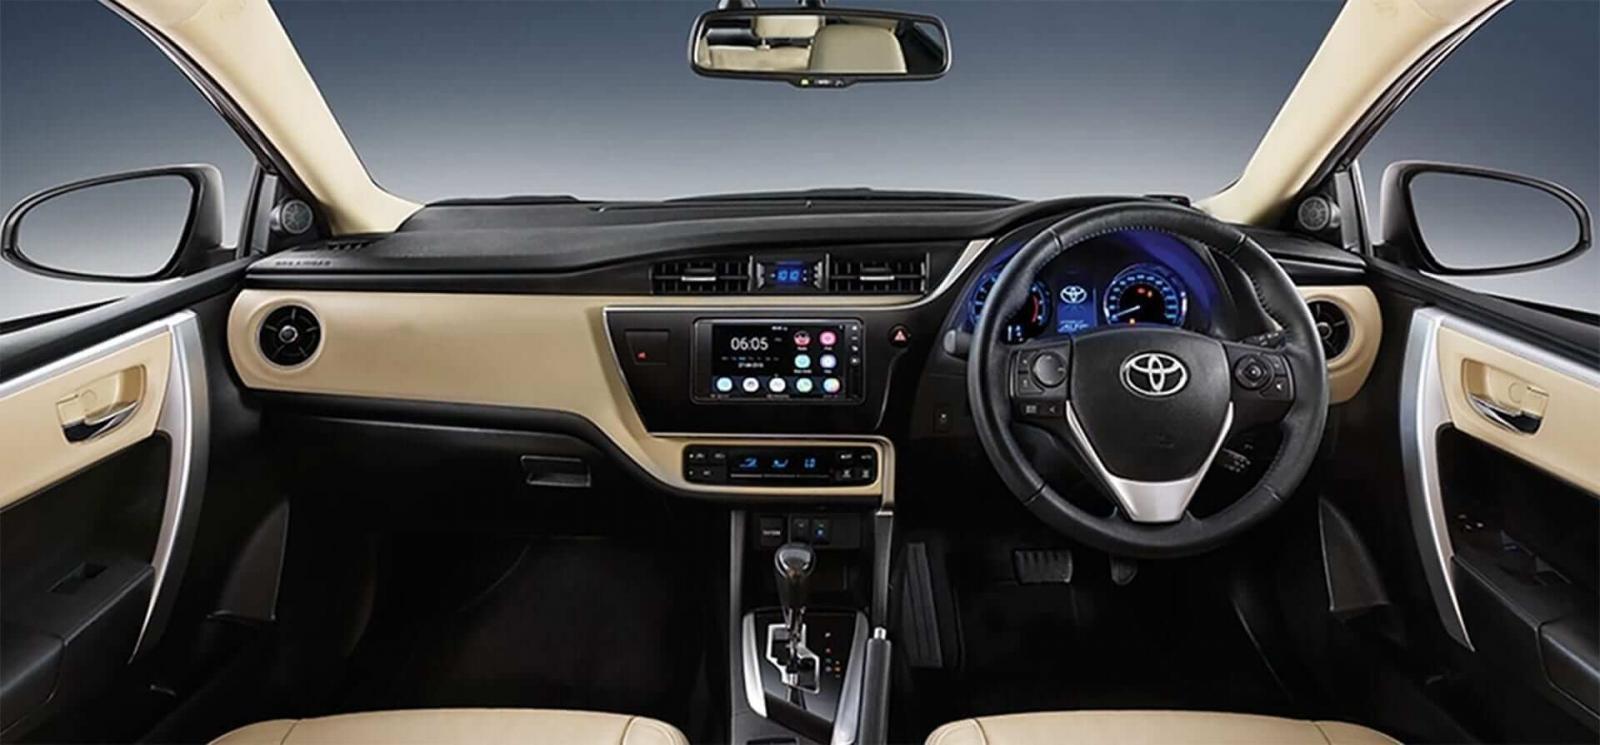 Nội thất xe Toyota Corolla Altis cũ